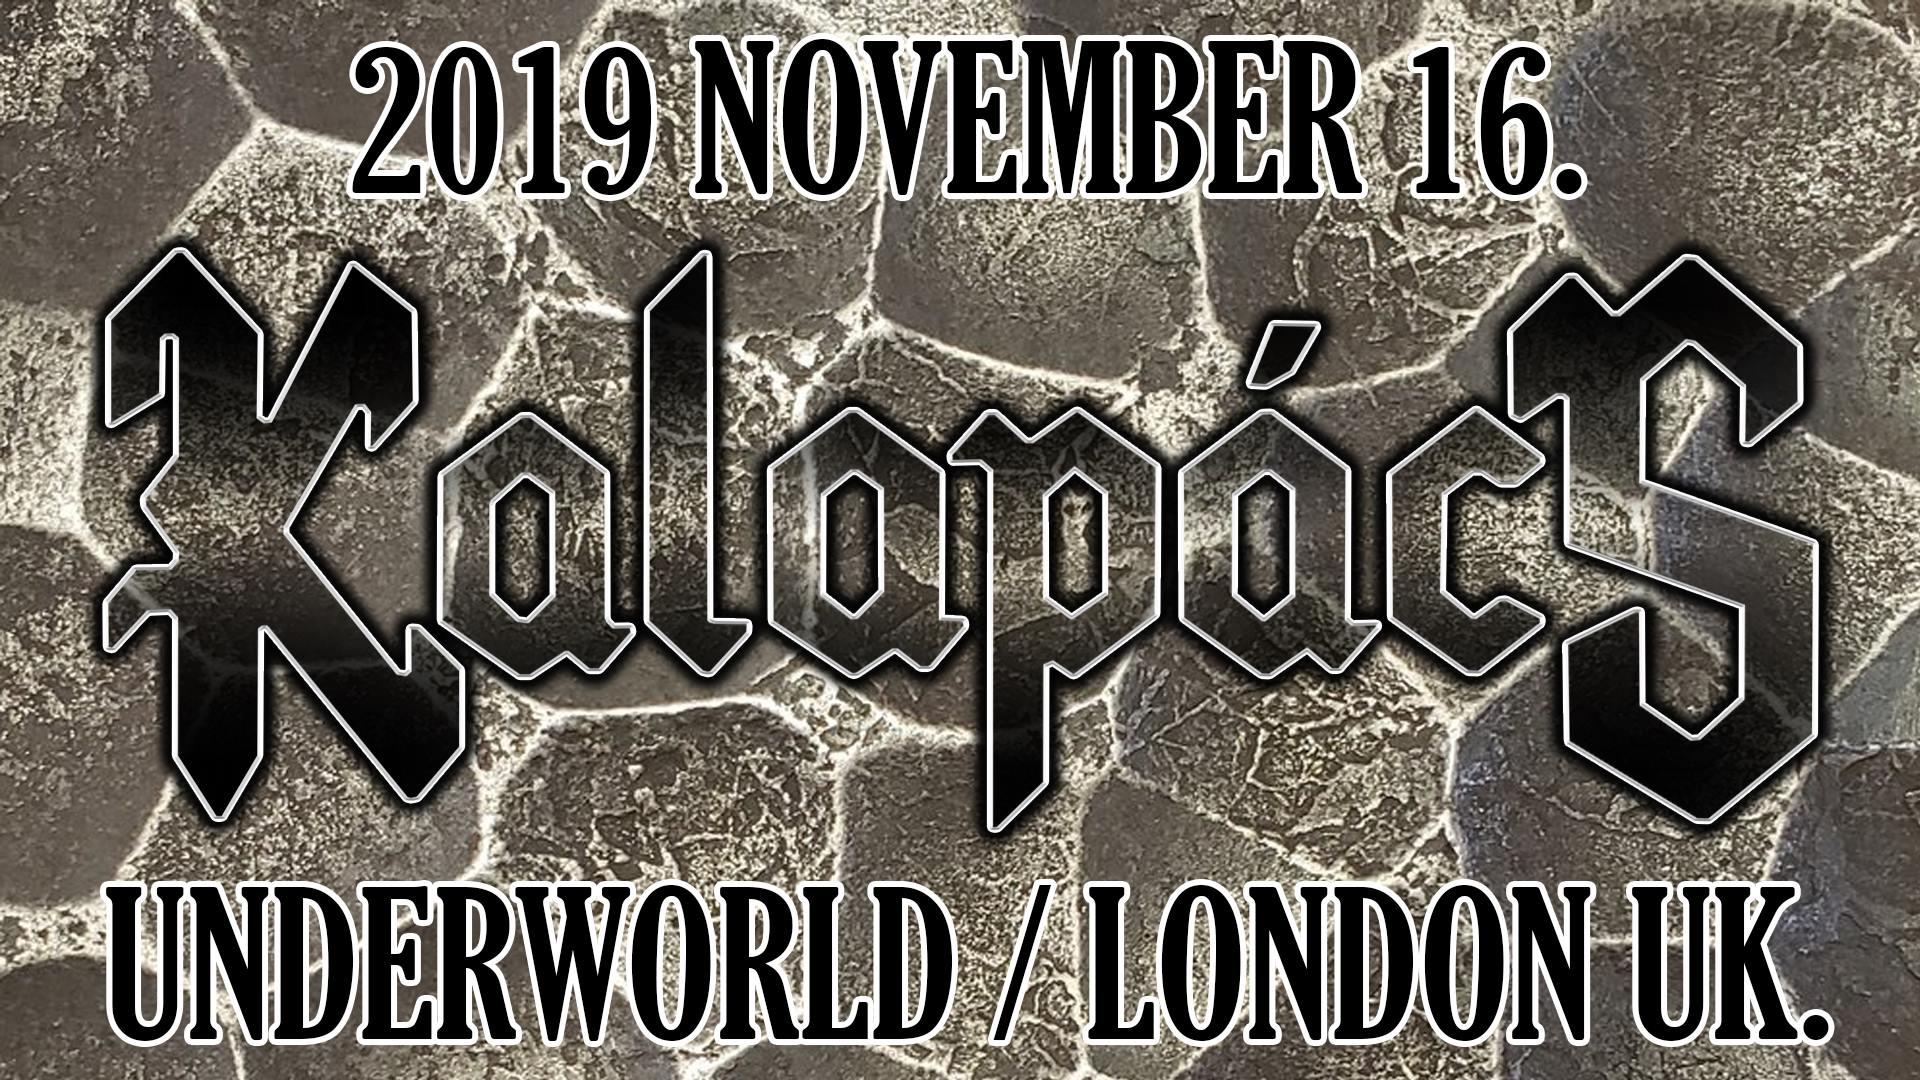 Kalapács koncert - London banner image